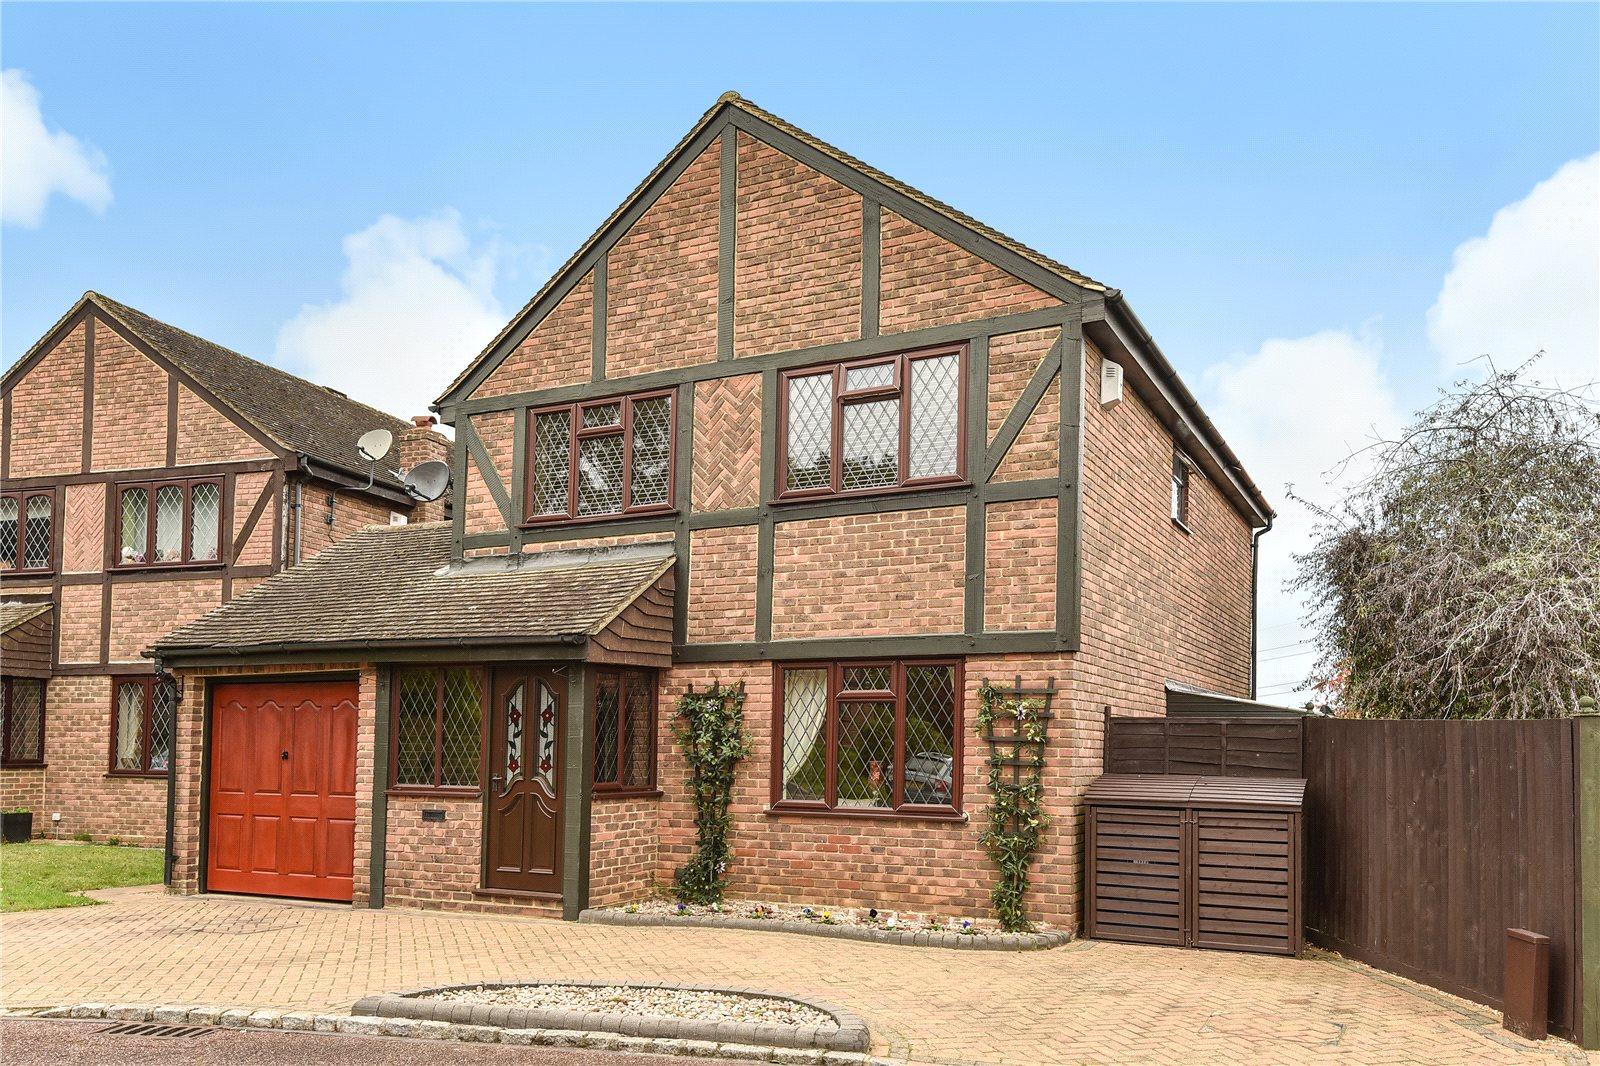 4 Bedrooms Detached House for sale in Darleydale Close, Owlsmoor, Sandhurst, Berkshire, GU47